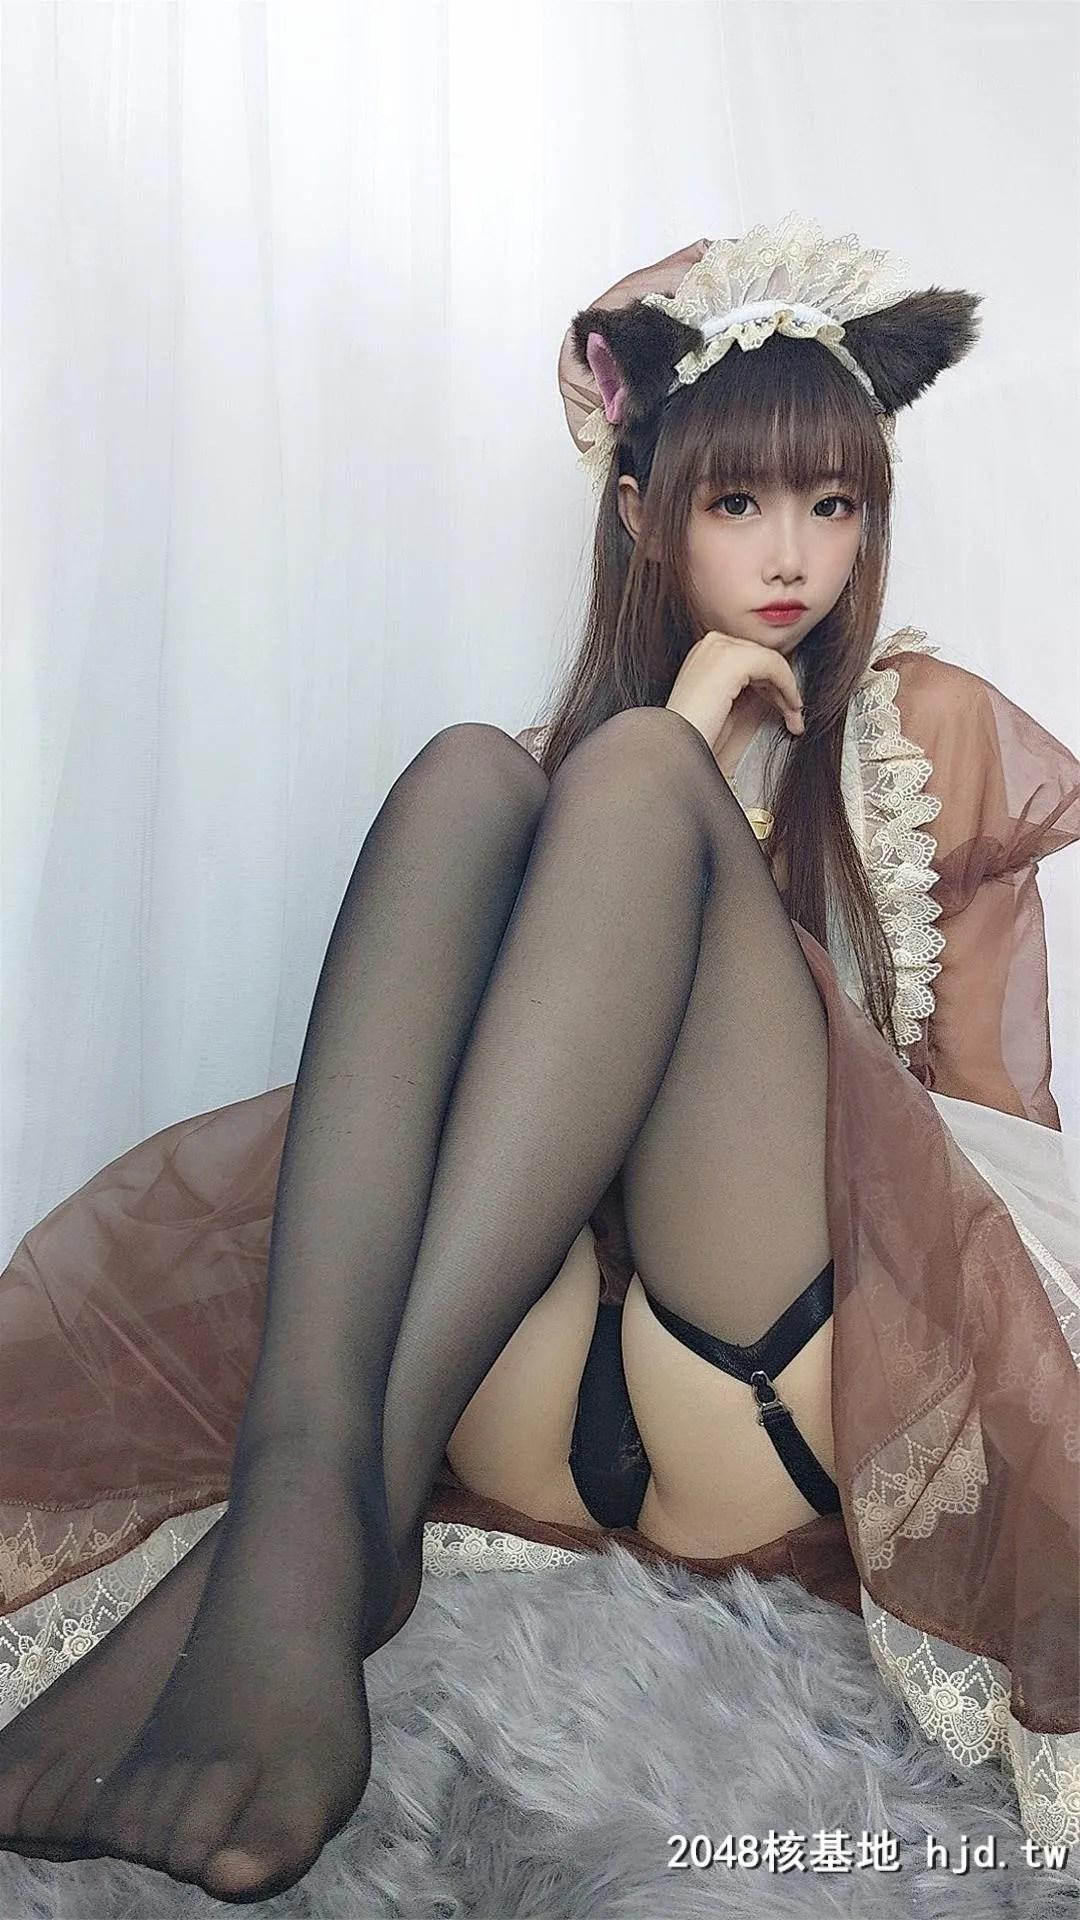 【Cos小姐姐雪琪】 透明女仆 [43P]插图(1)